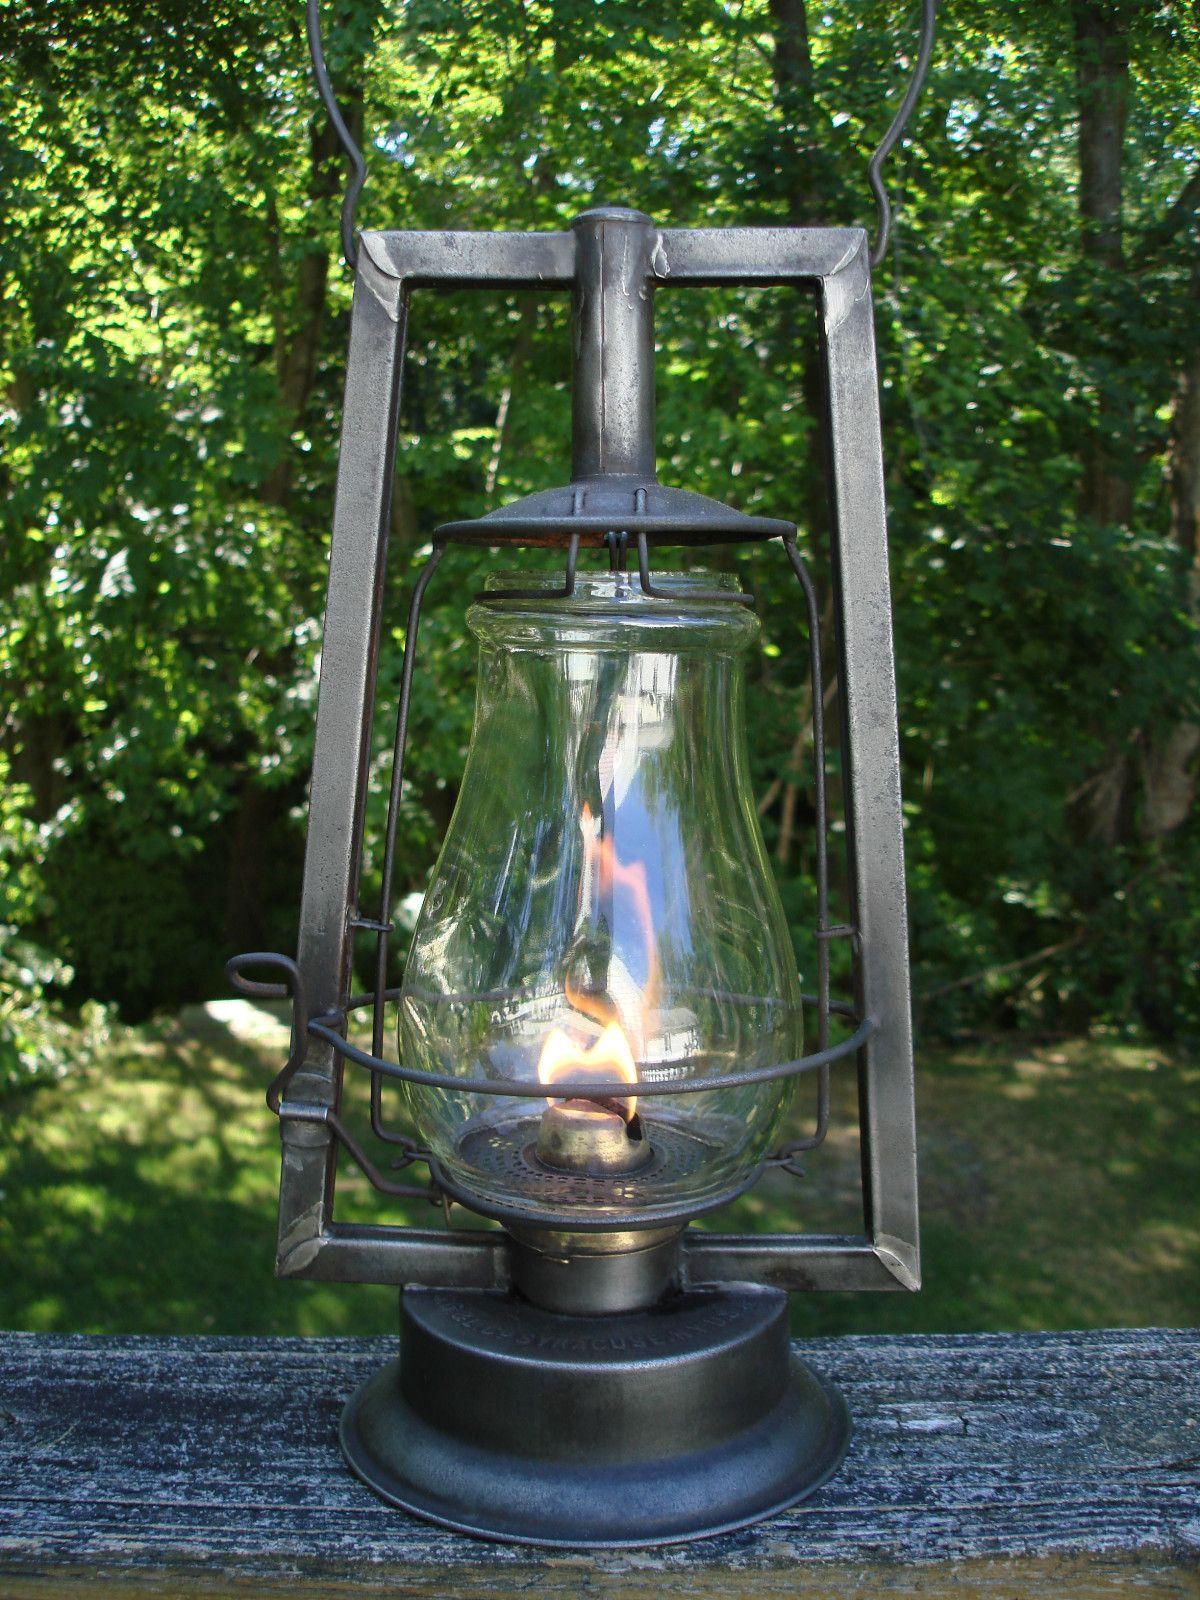 S G Amp L Steam Gauge Amp Lantern Victor 1898 1900 Made